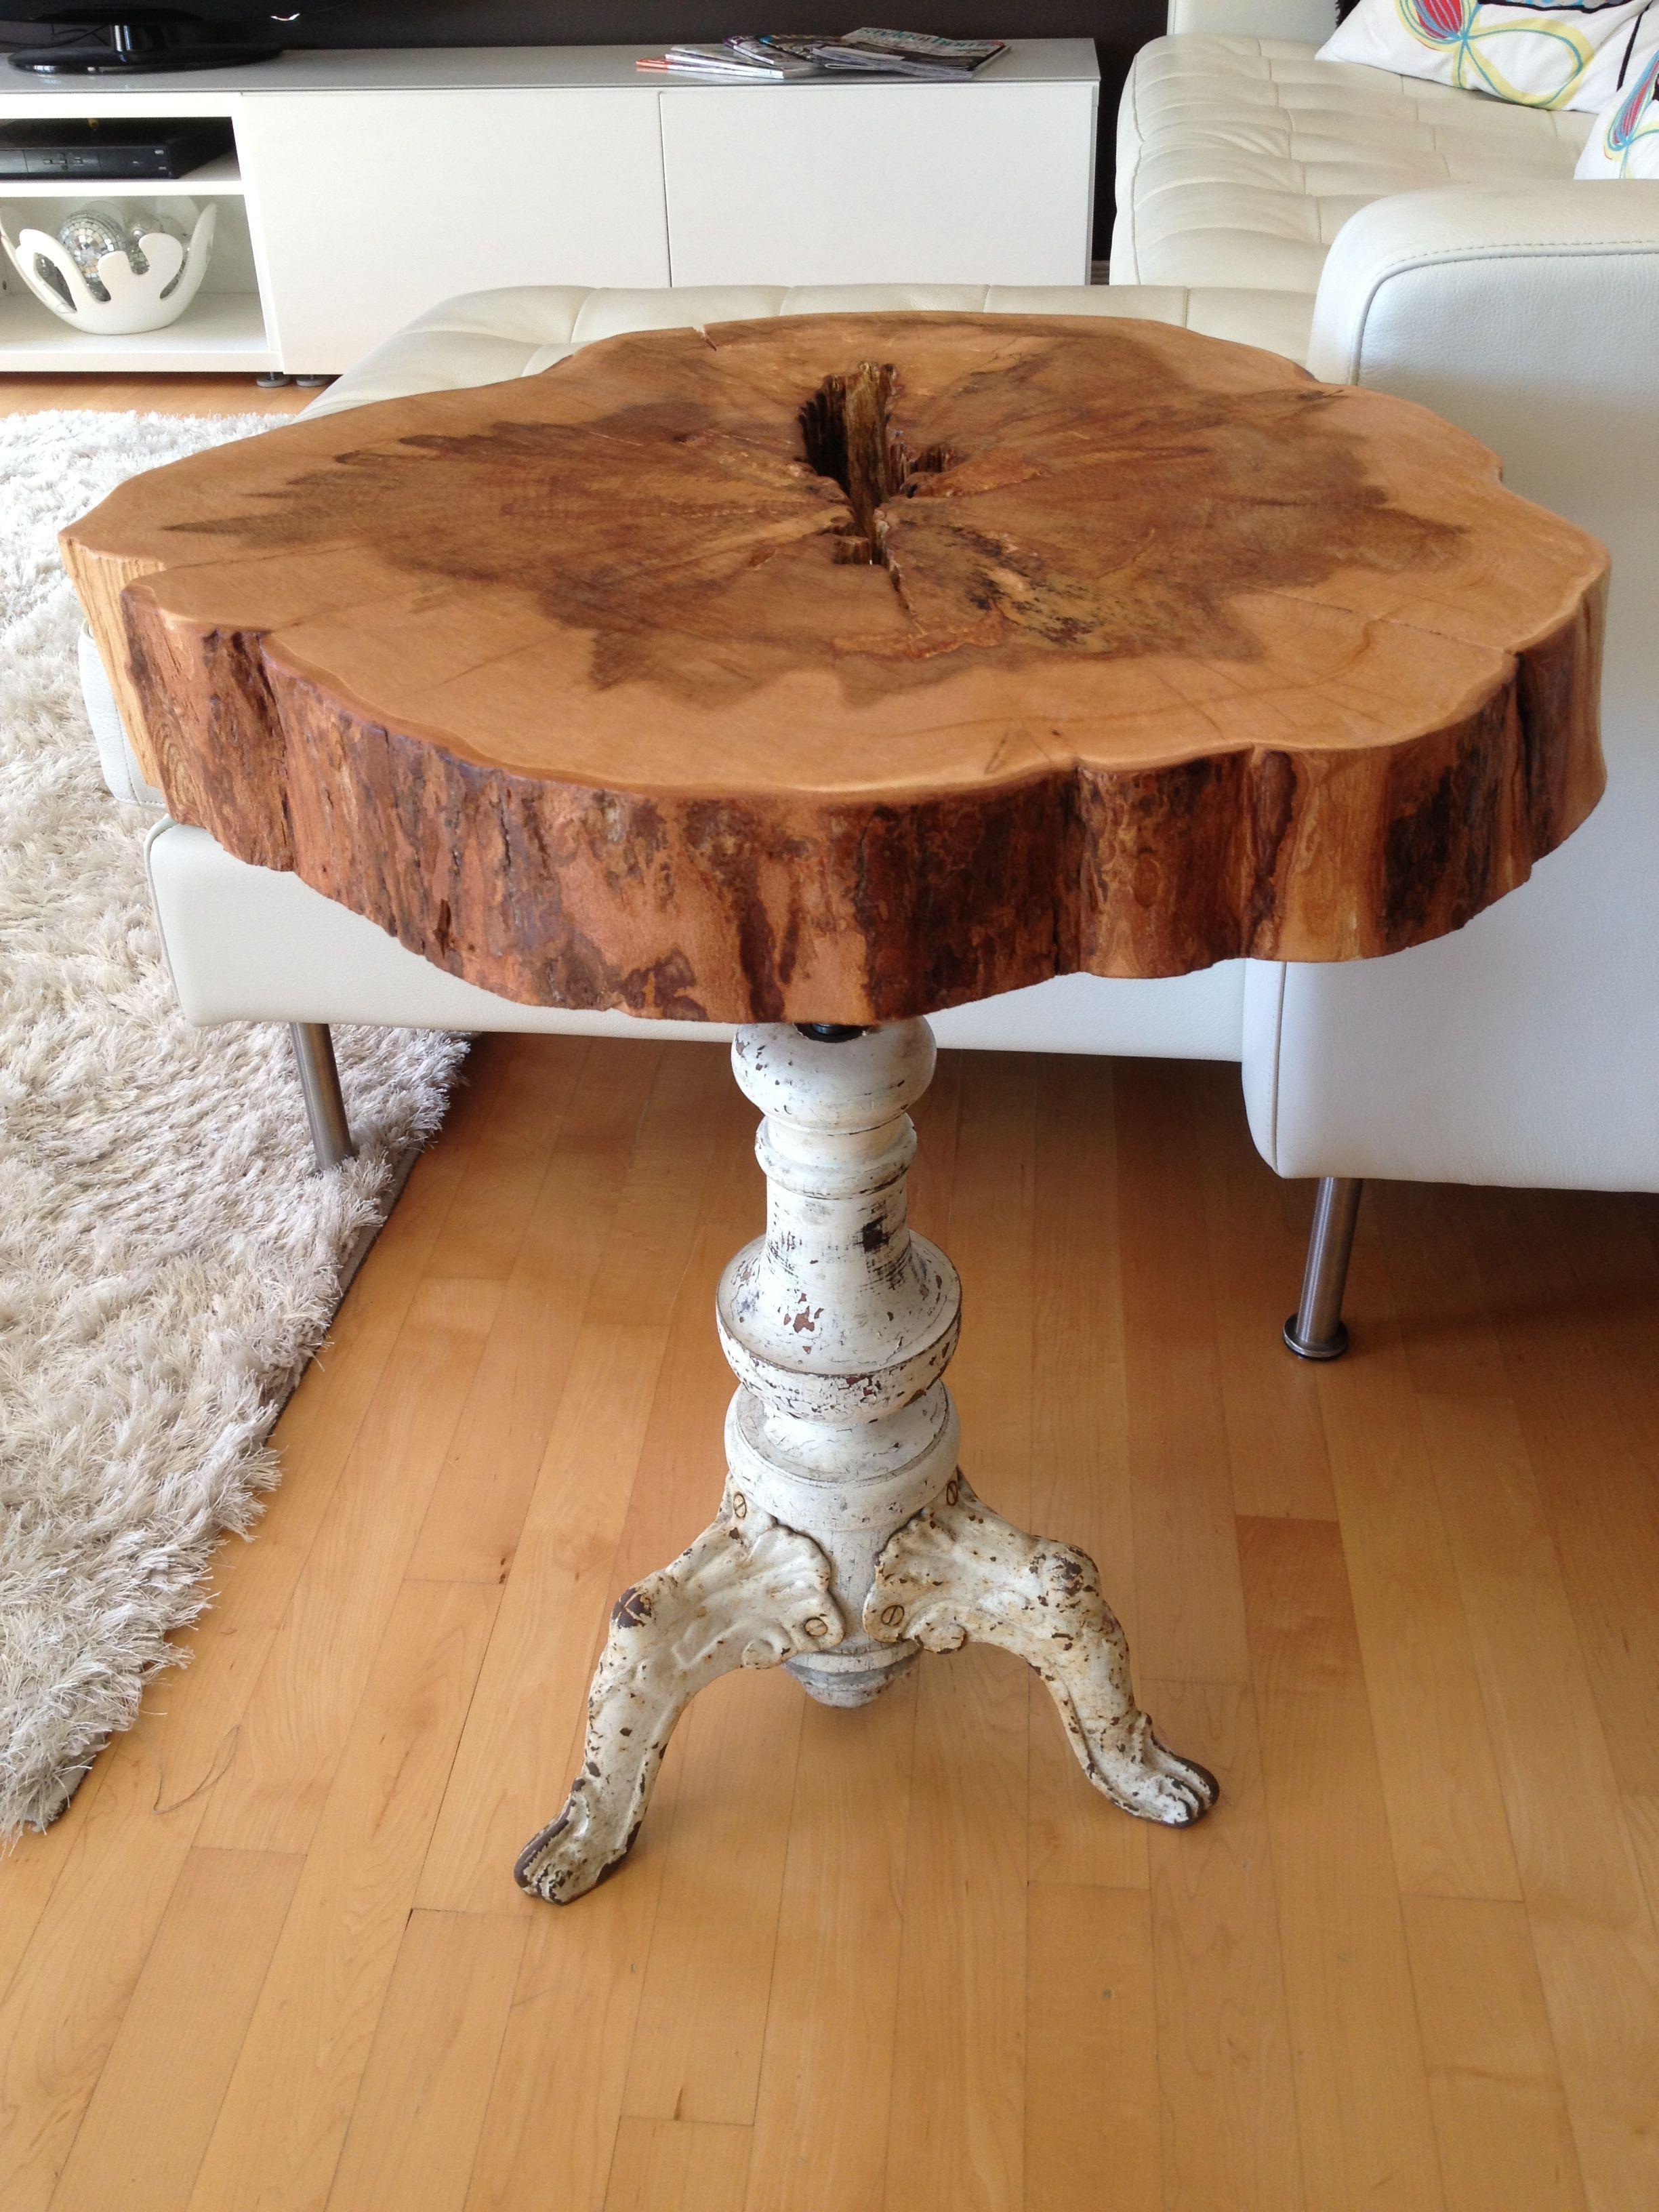 Diy tree stump table ideas u how to make them in decor